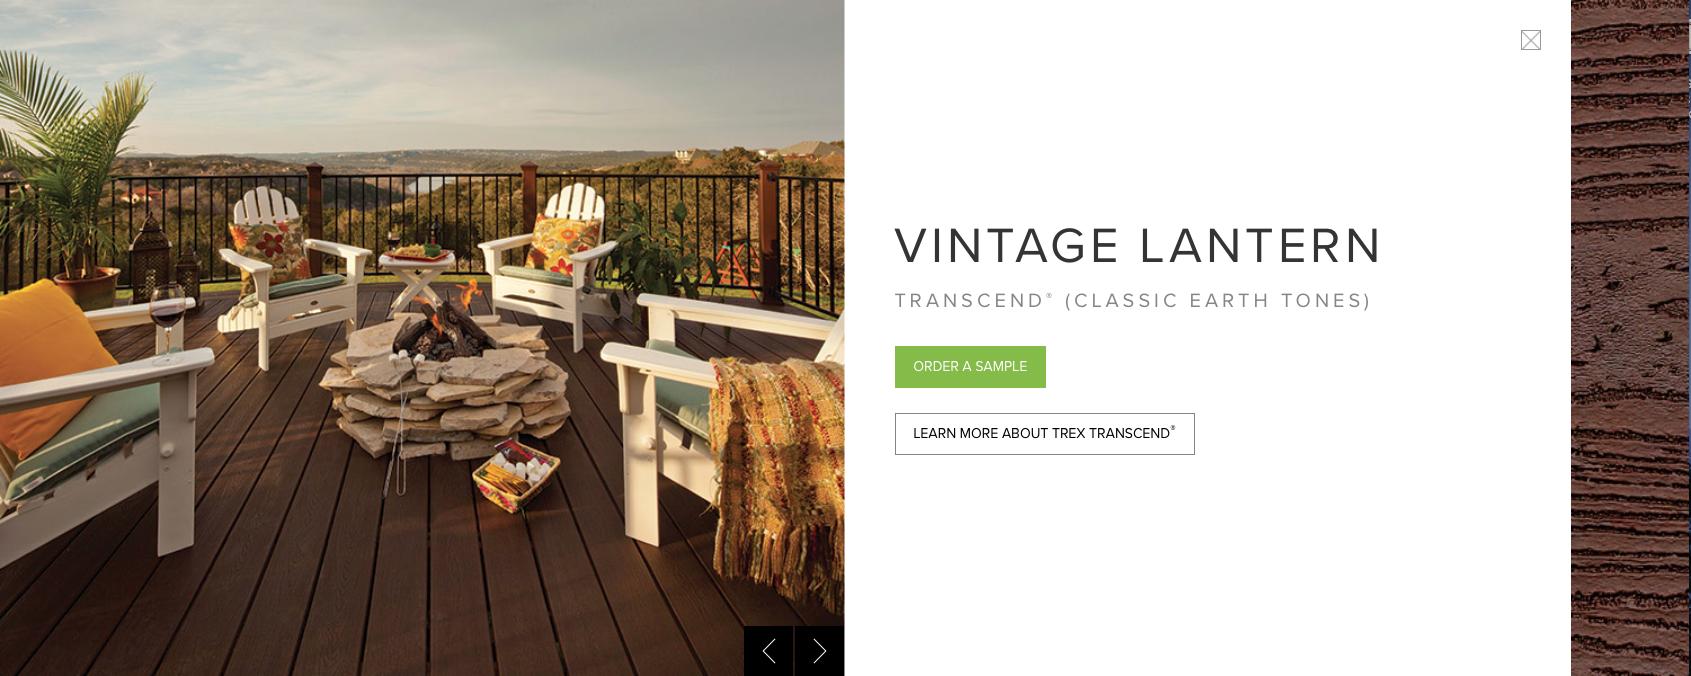 Trex Transcend (Classic Earth Tones) Vintage Lantern